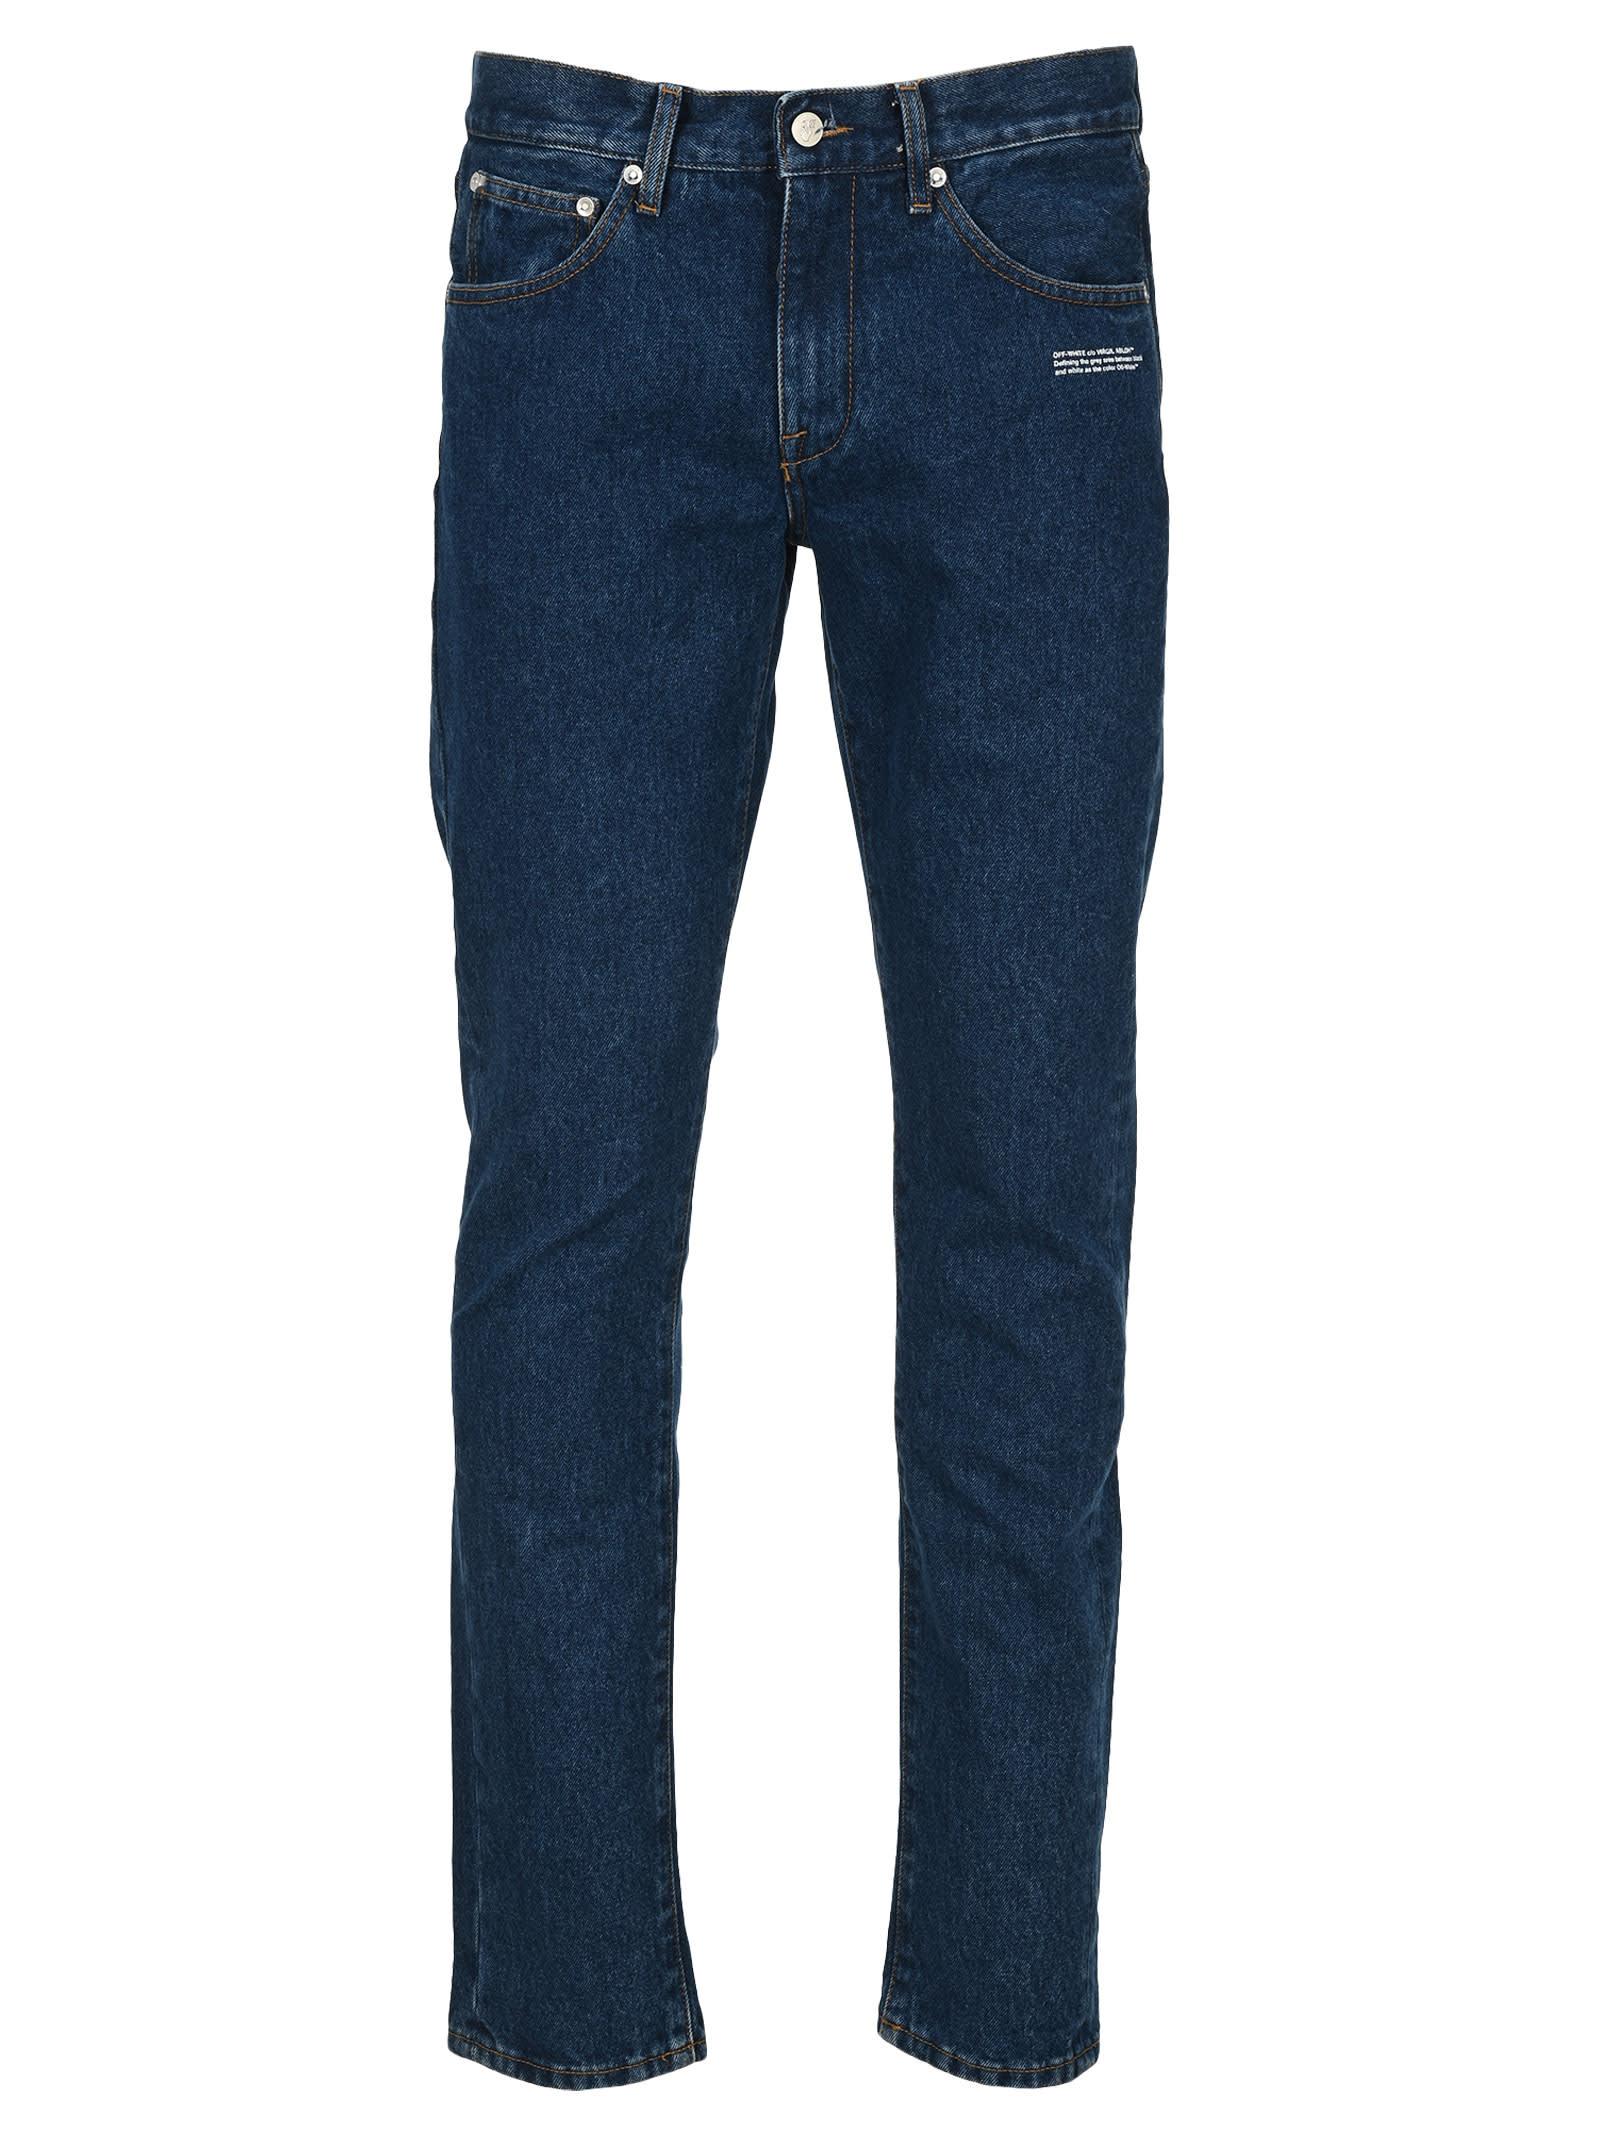 Off White Diag Pocket Slim Jeans